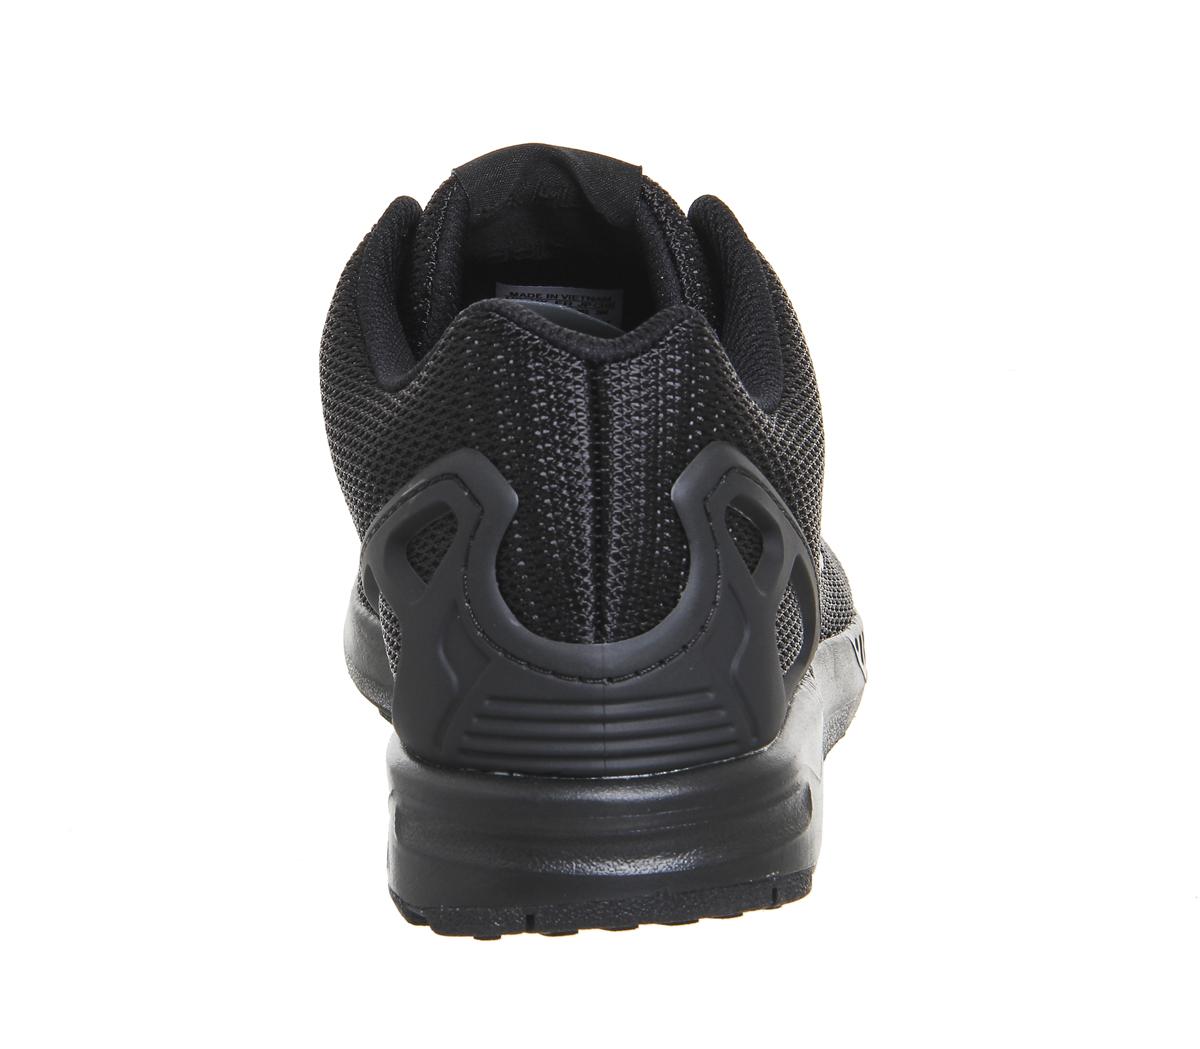 oferta de adidas zx 750